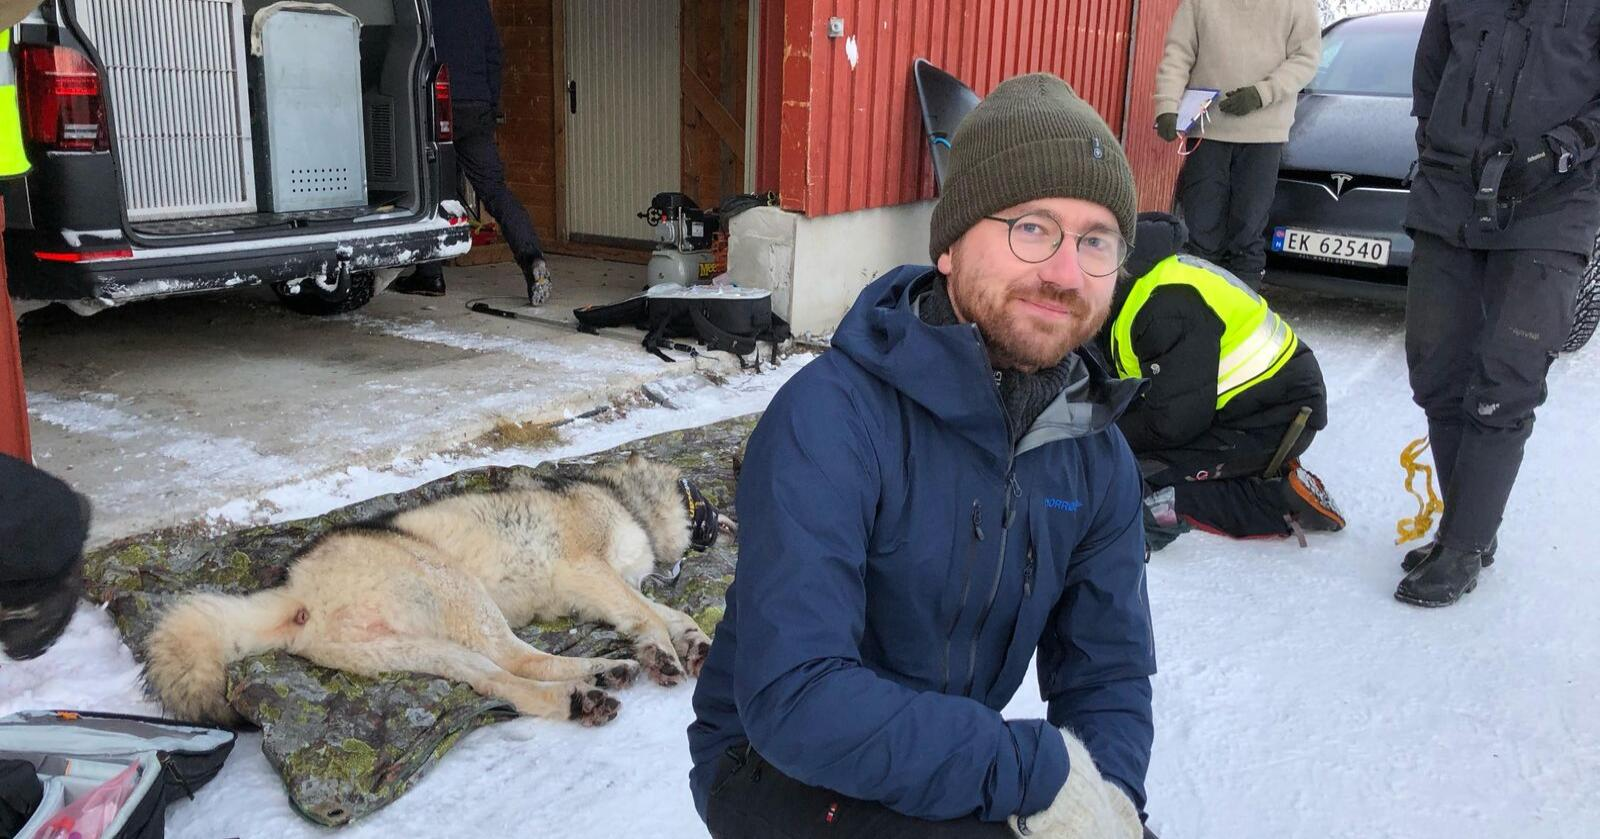 – Vi har hatt de beste pilotene og skytterne i sving i dag, sier klima- og miljøminister Sveinung Rotevatn (V). Foto: Klima- og miljødepartementet